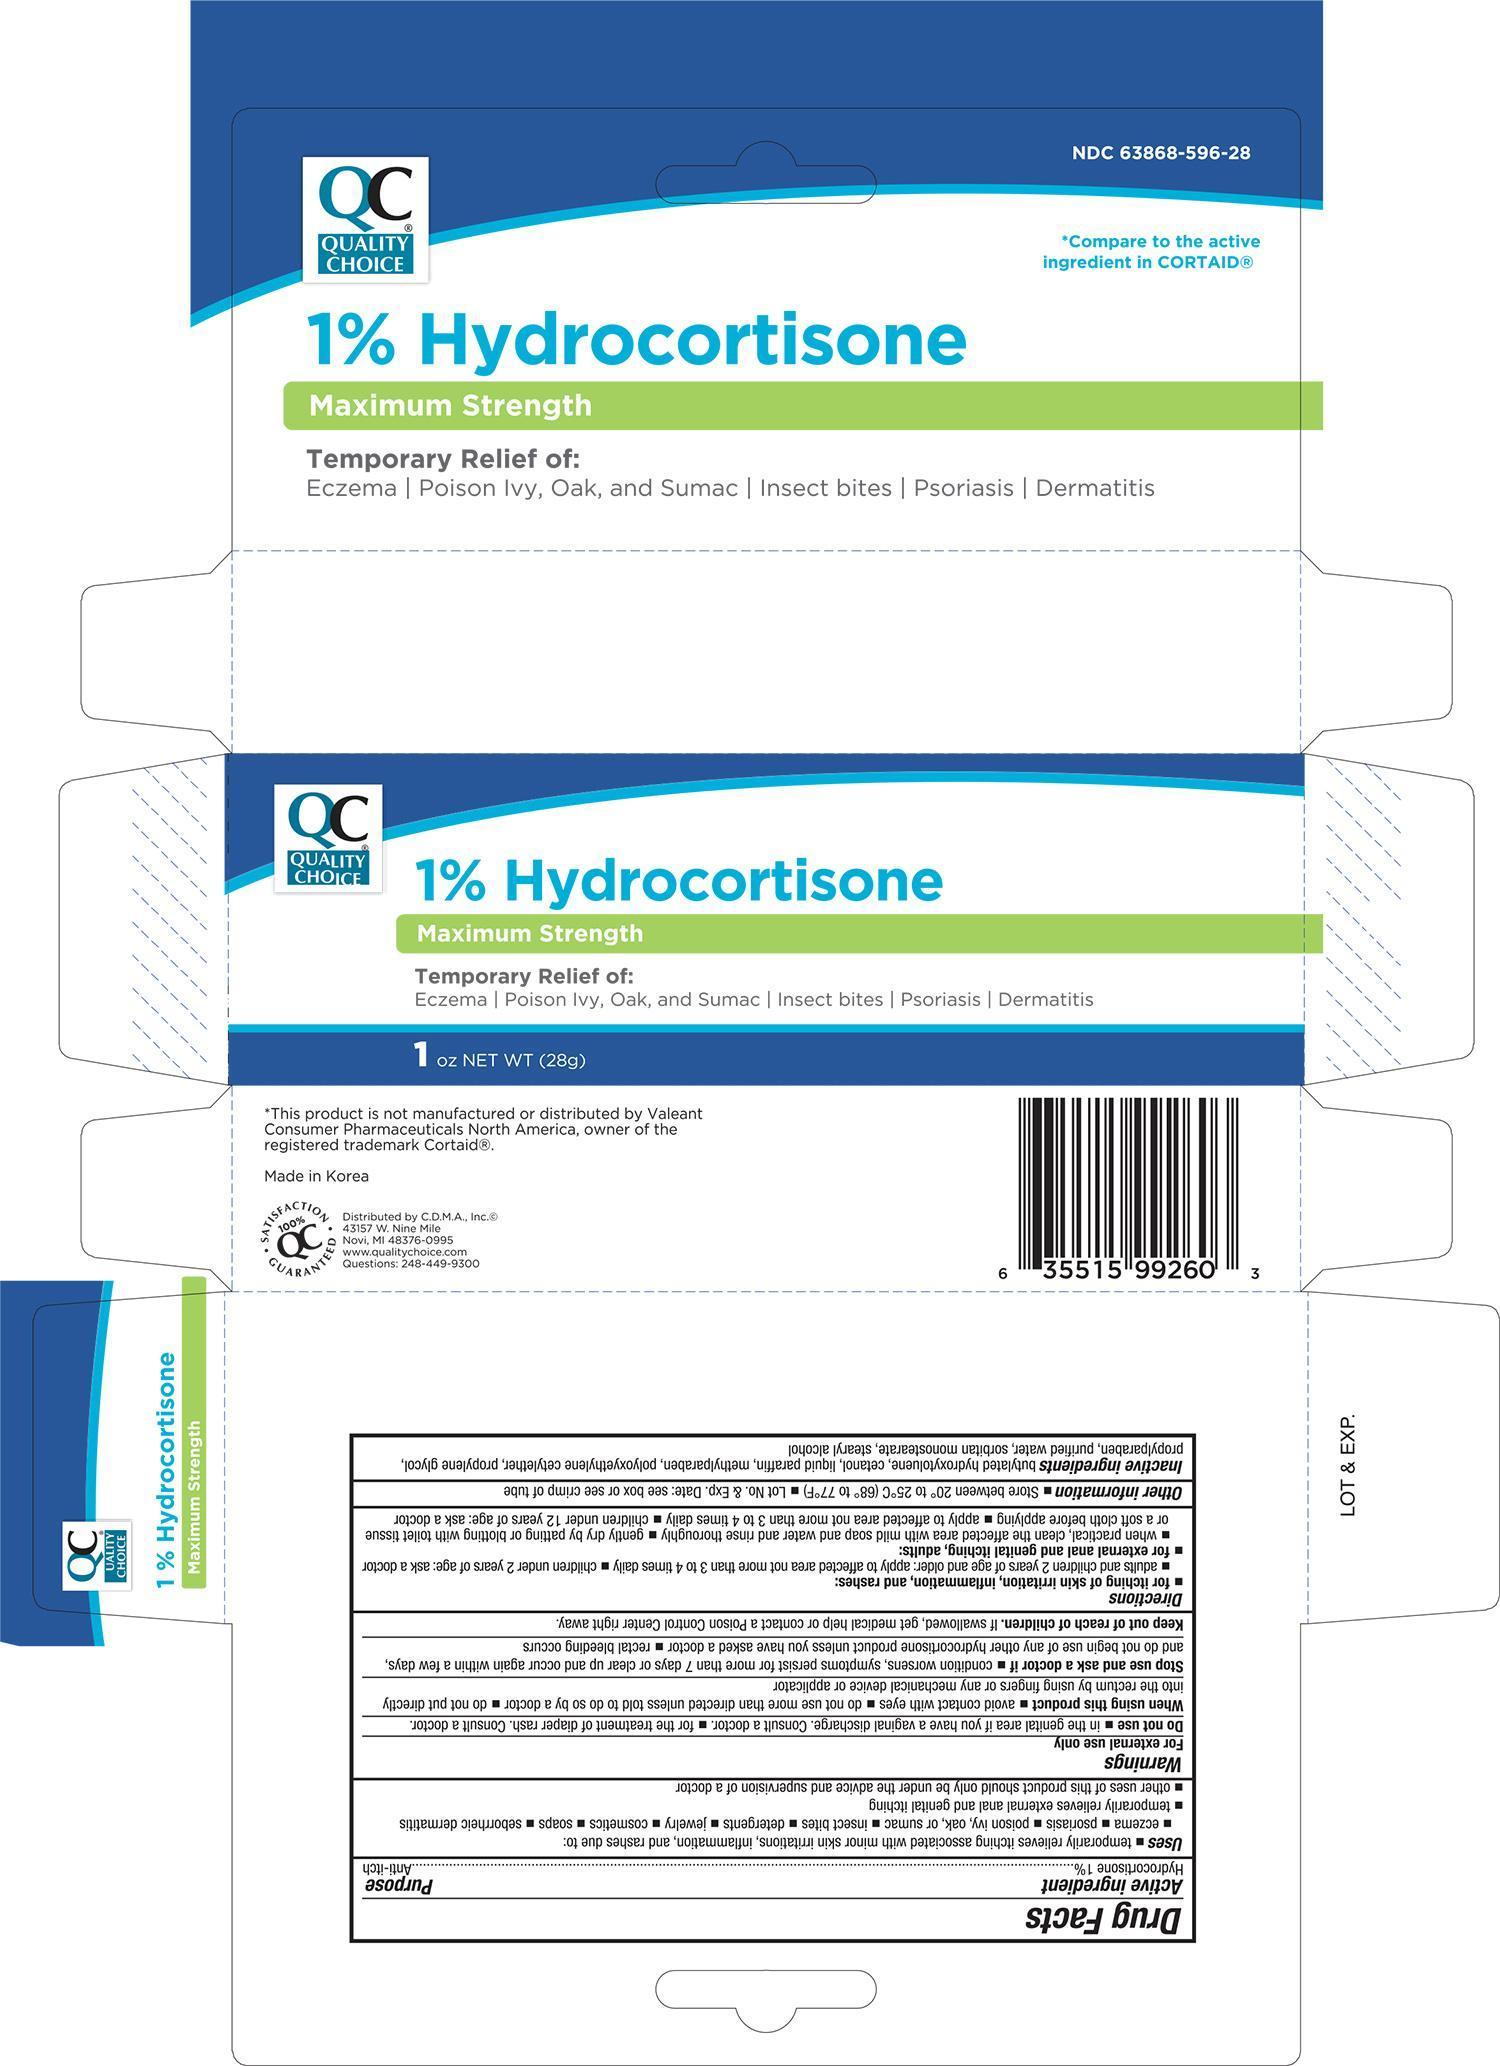 Quality Choice Hydrocortisone Maximum Strength (Hydrocortisone) Cream [Chain Drug Marketing Association Inc]